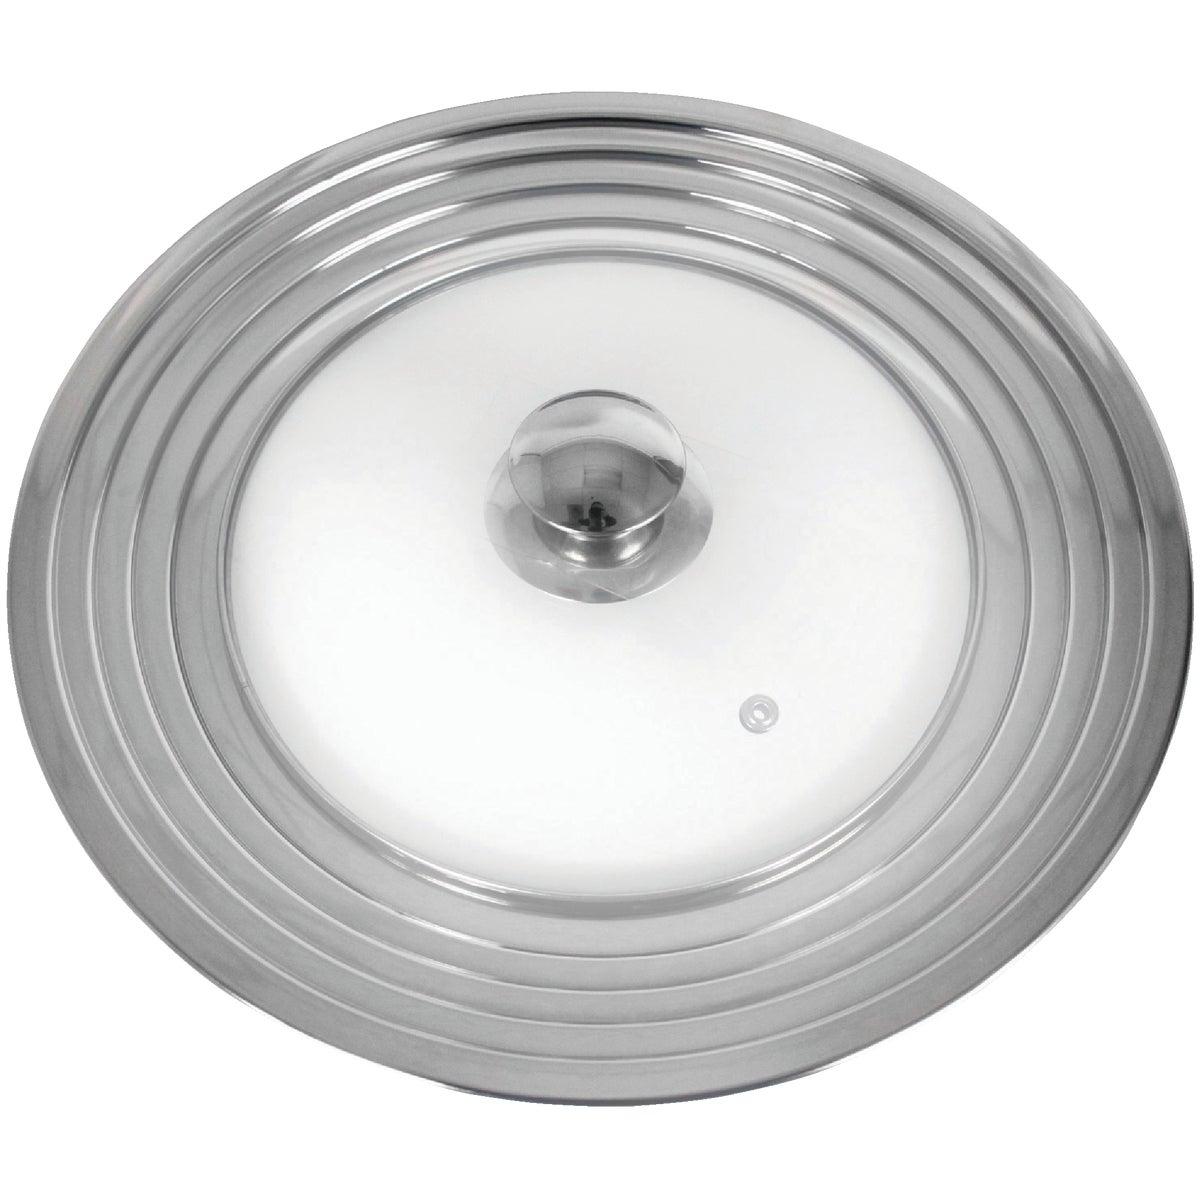 UNIVERSAL GLASS LID - 36140 by M E Heuck Company